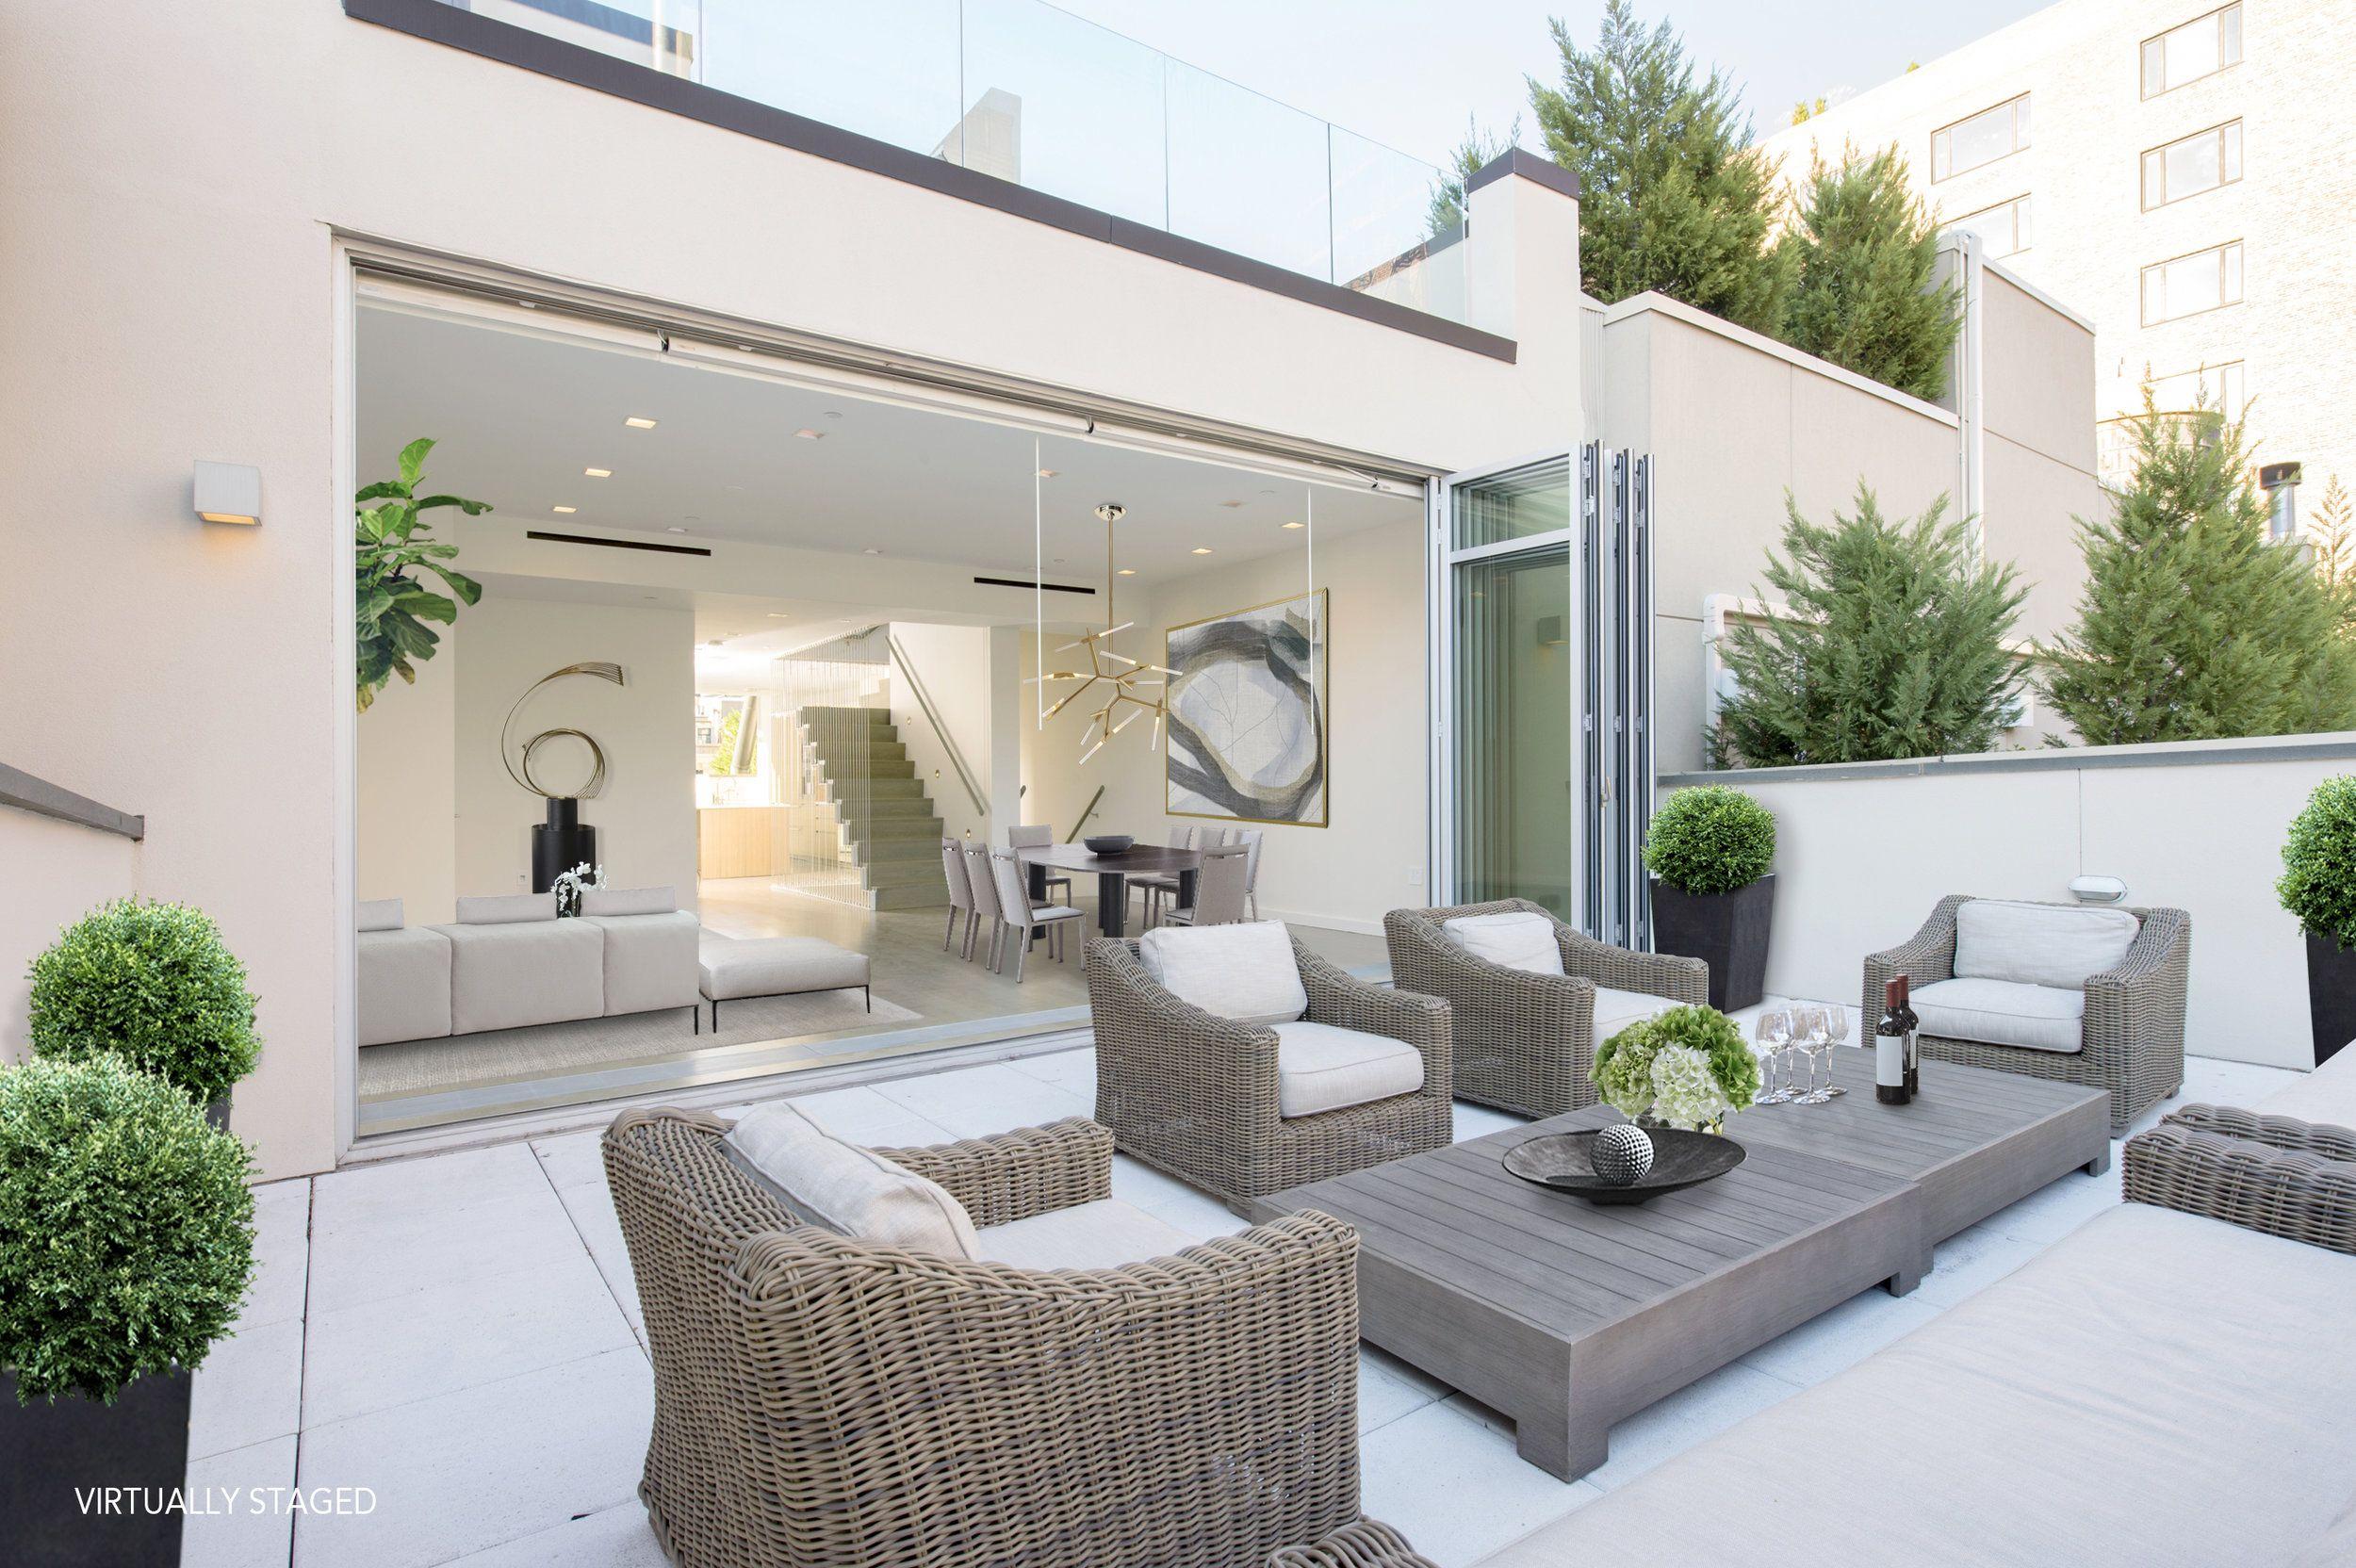 Terrace111MercerStPH.jpg   Outdoor furniture sets, Luxury ... on Virtual Patio Designer id=68155